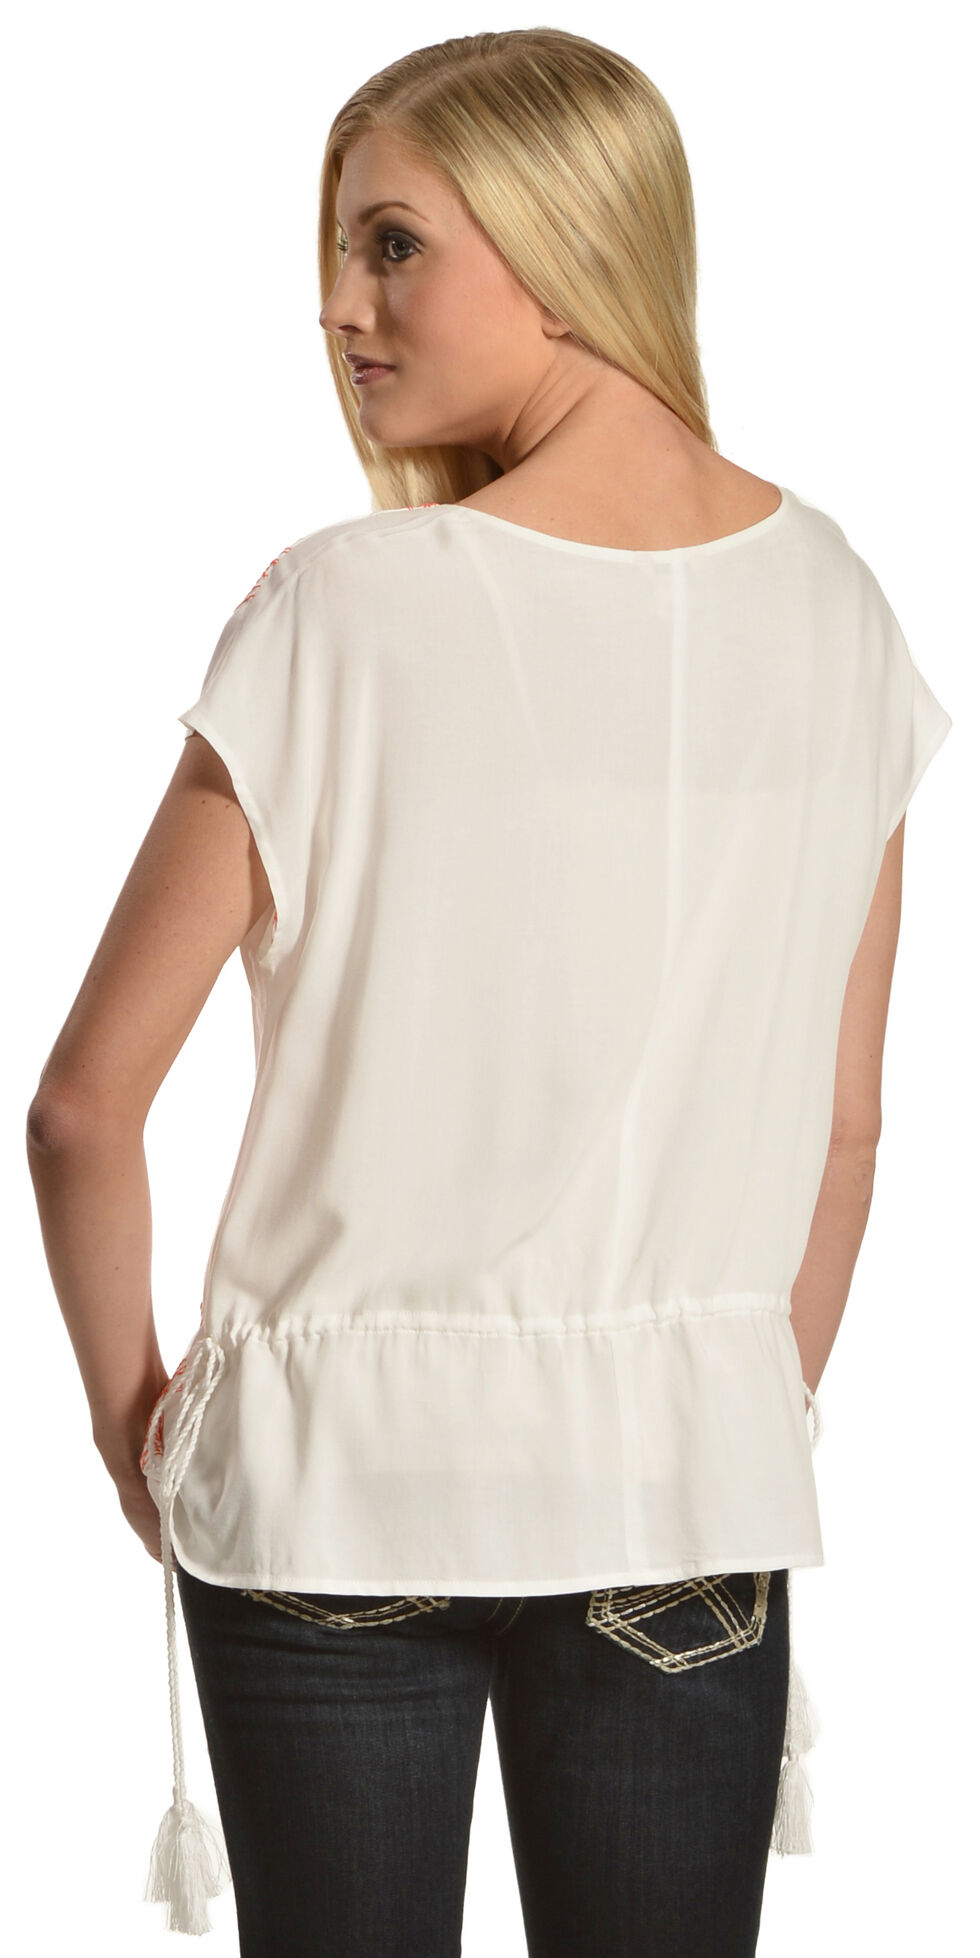 Ariat Women's Joyce Tunic Top , White, hi-res